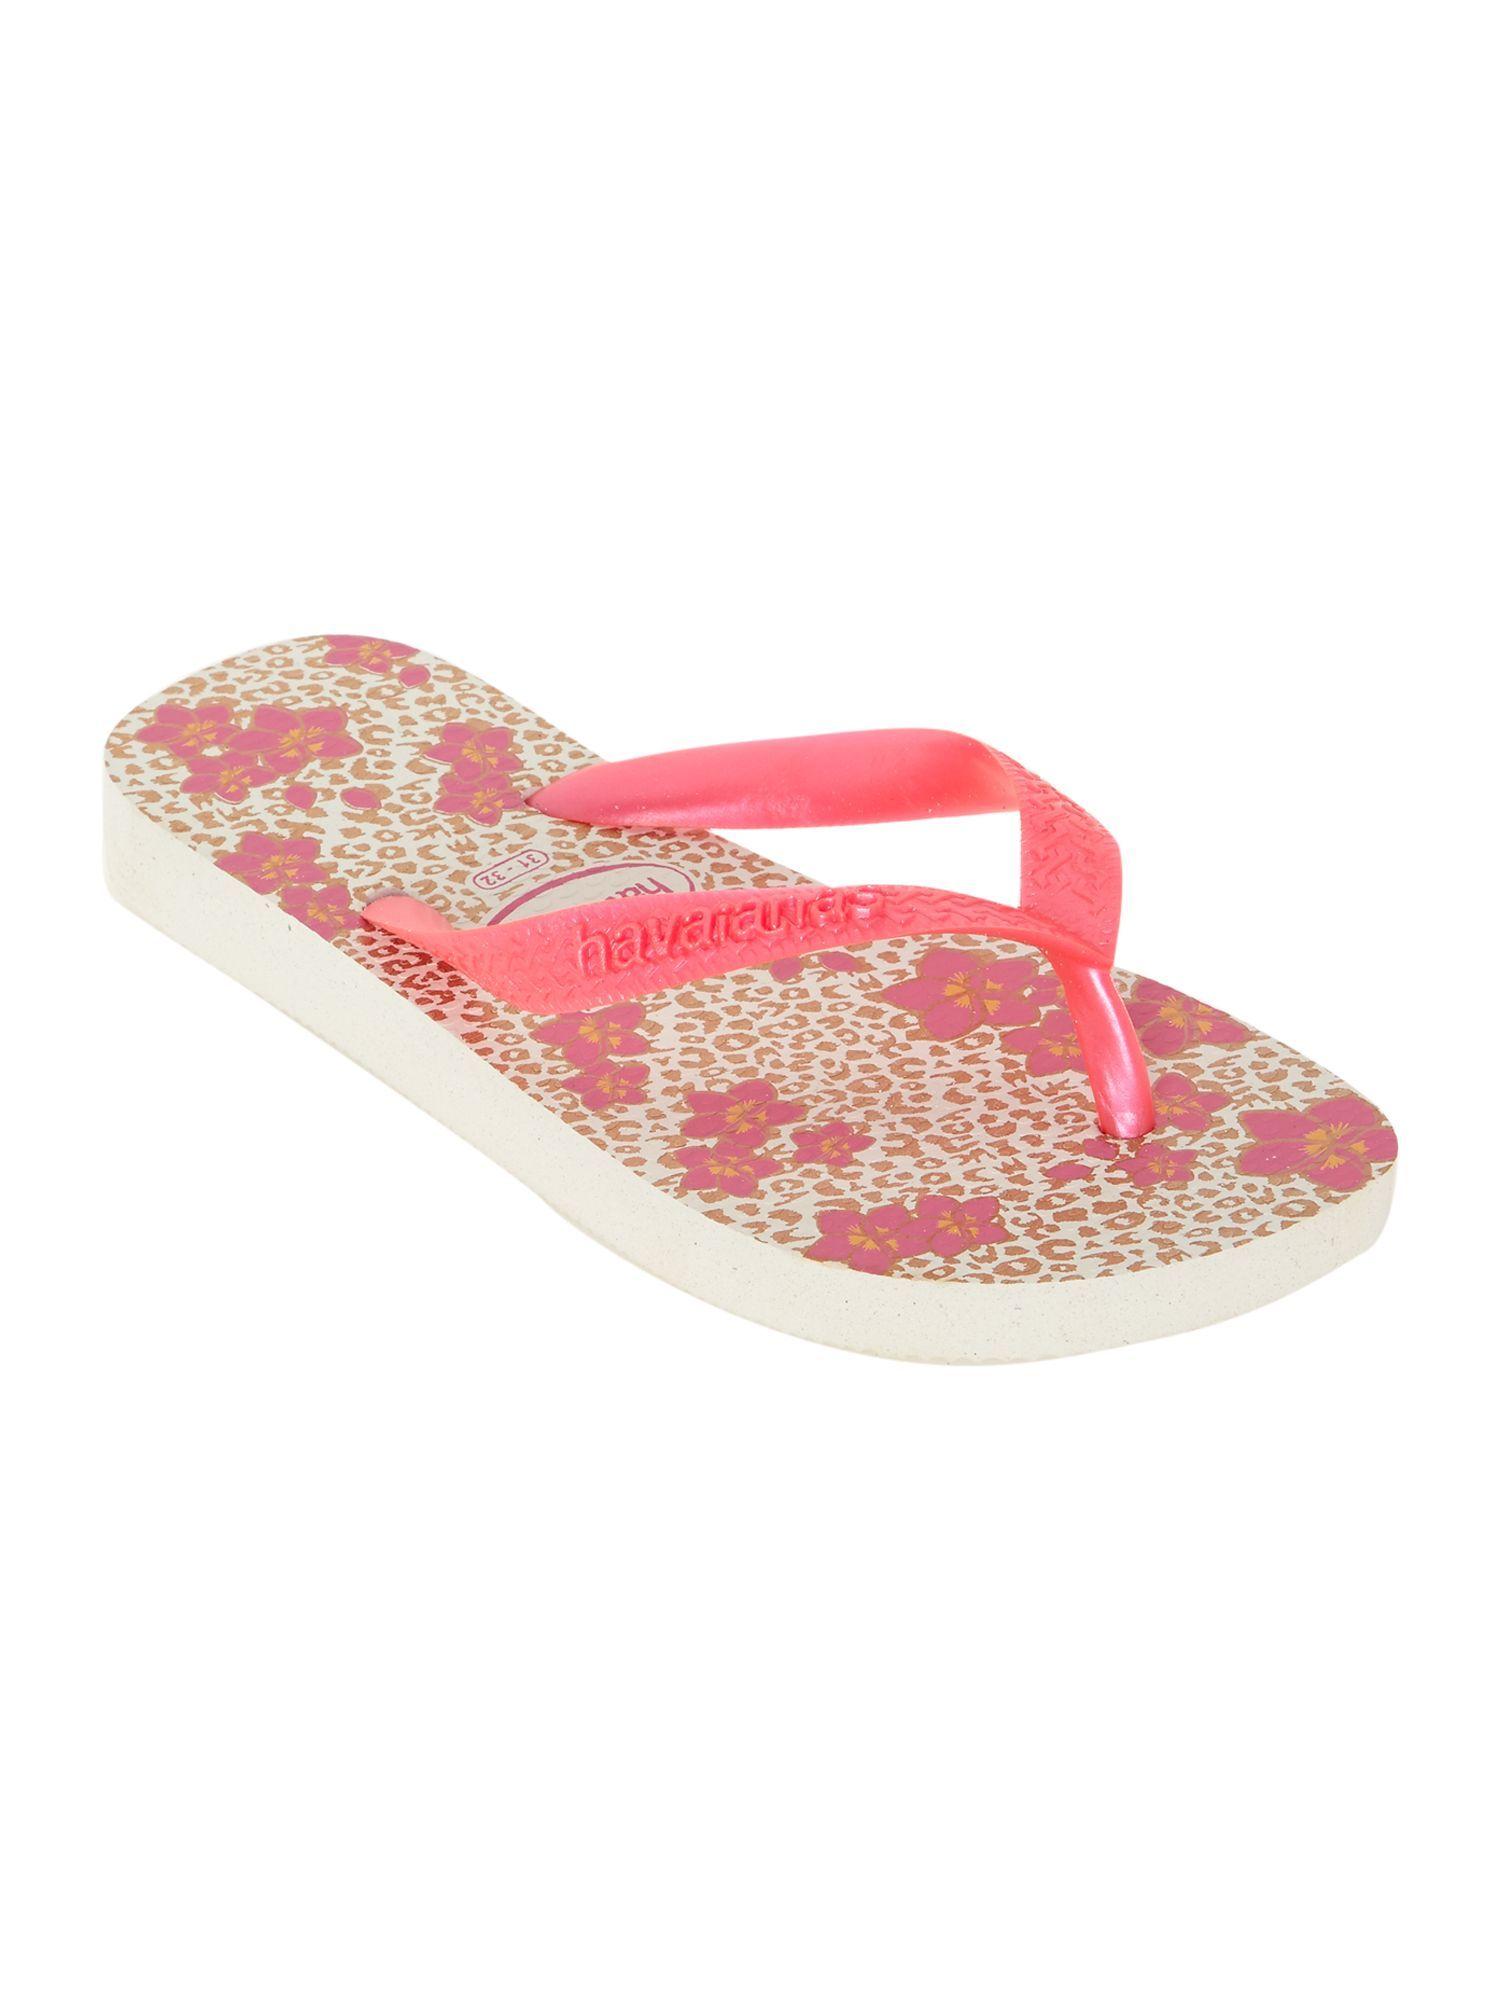 64b840b9462b Havaianas Girls Floral animal print flip flops